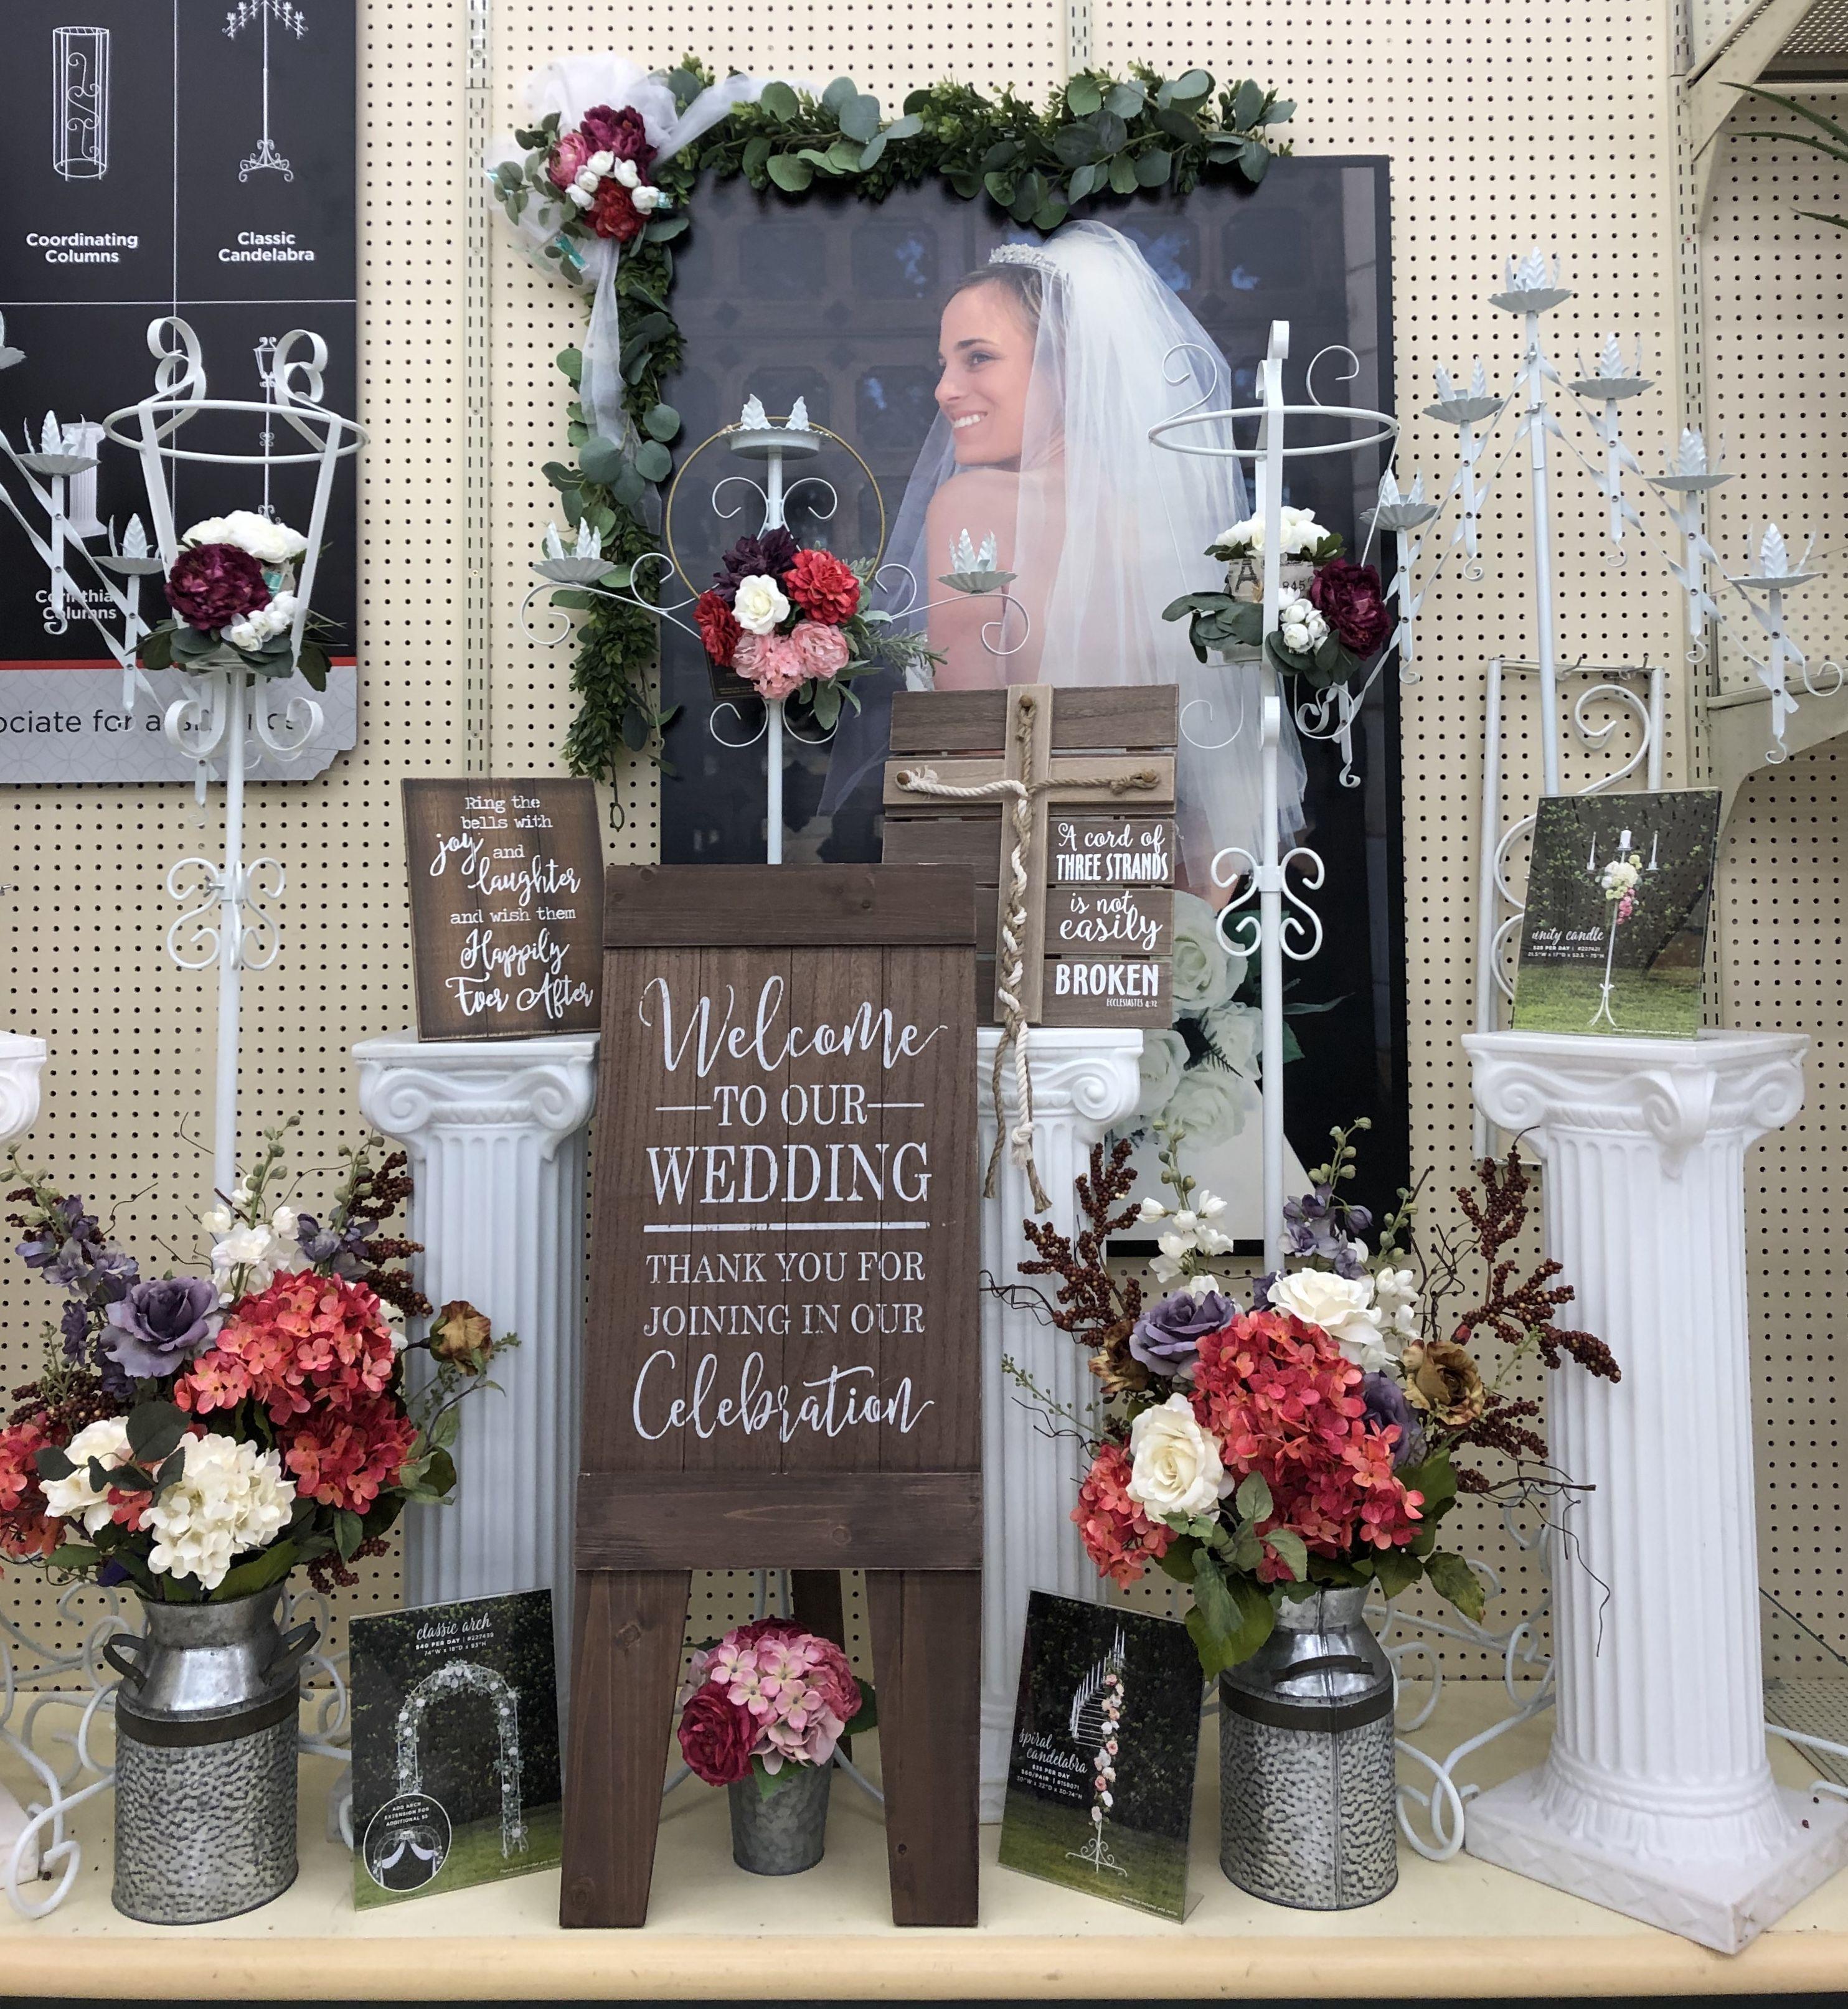 Hobby Lobby Wedding Ideas: Hobby Lobby Wedding Display In 2019